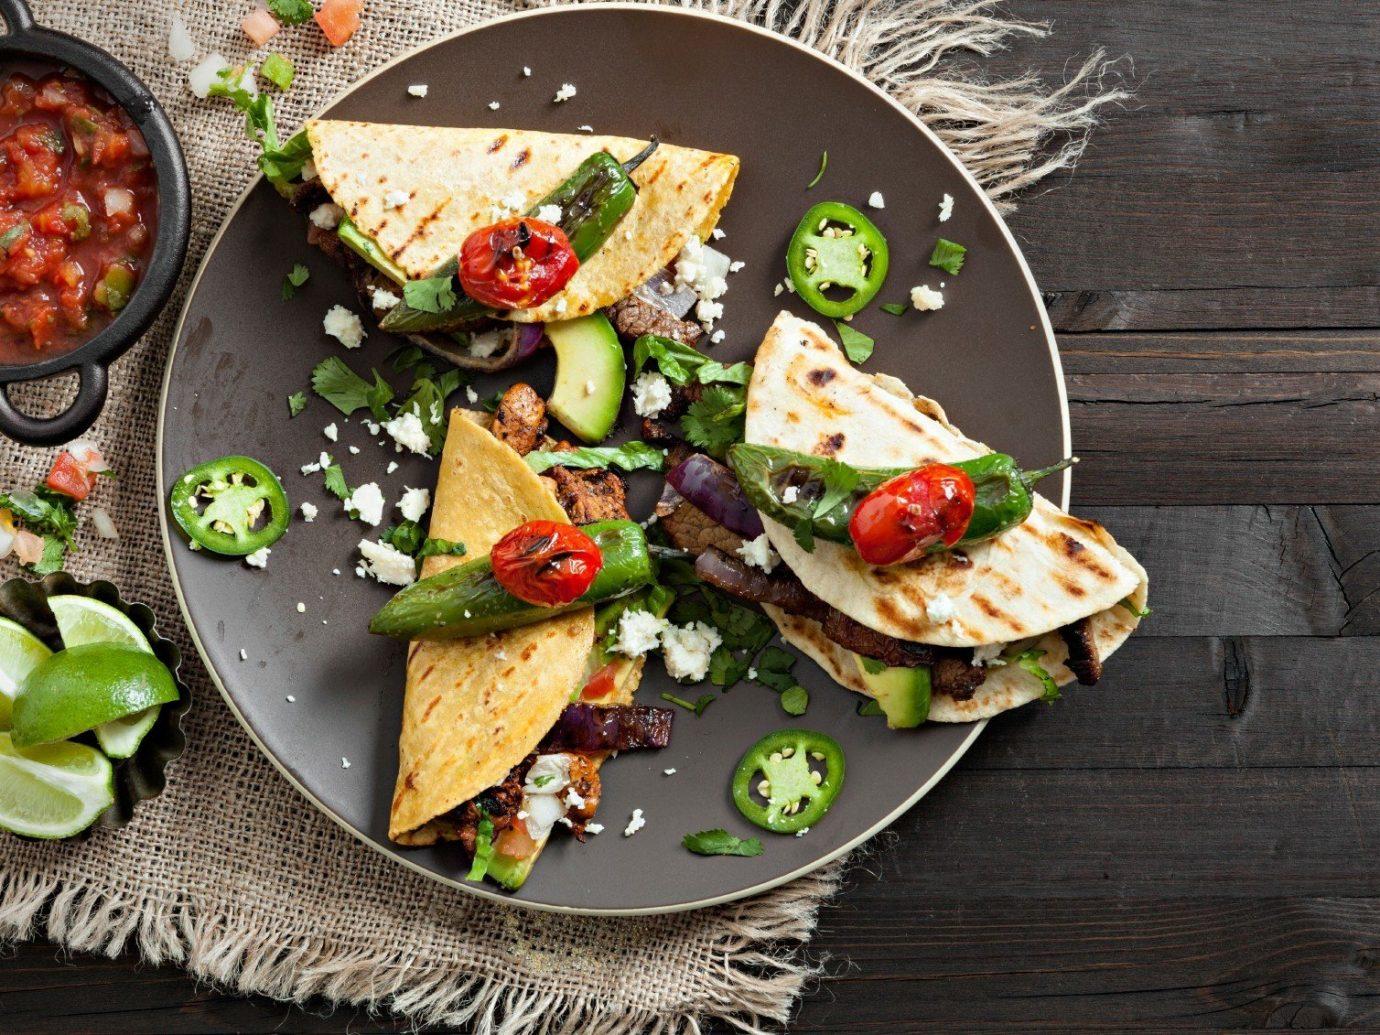 Trip Ideas food dish plate produce cuisine vegetable meal salad vegetarian food flowering plant meat